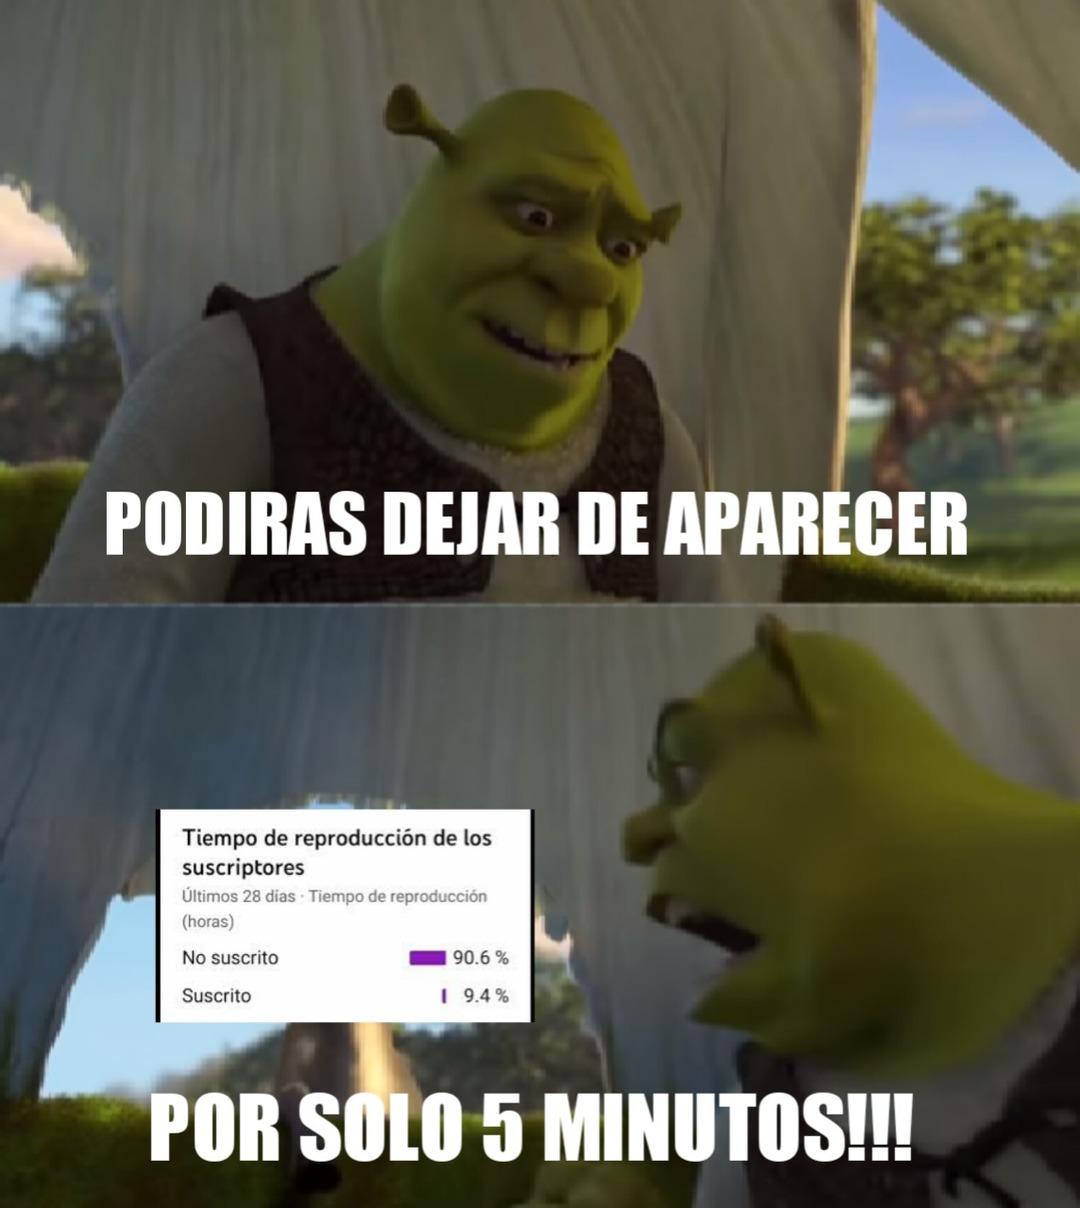 Esa Cosa Me Tiene Hasta La Chingada - meme